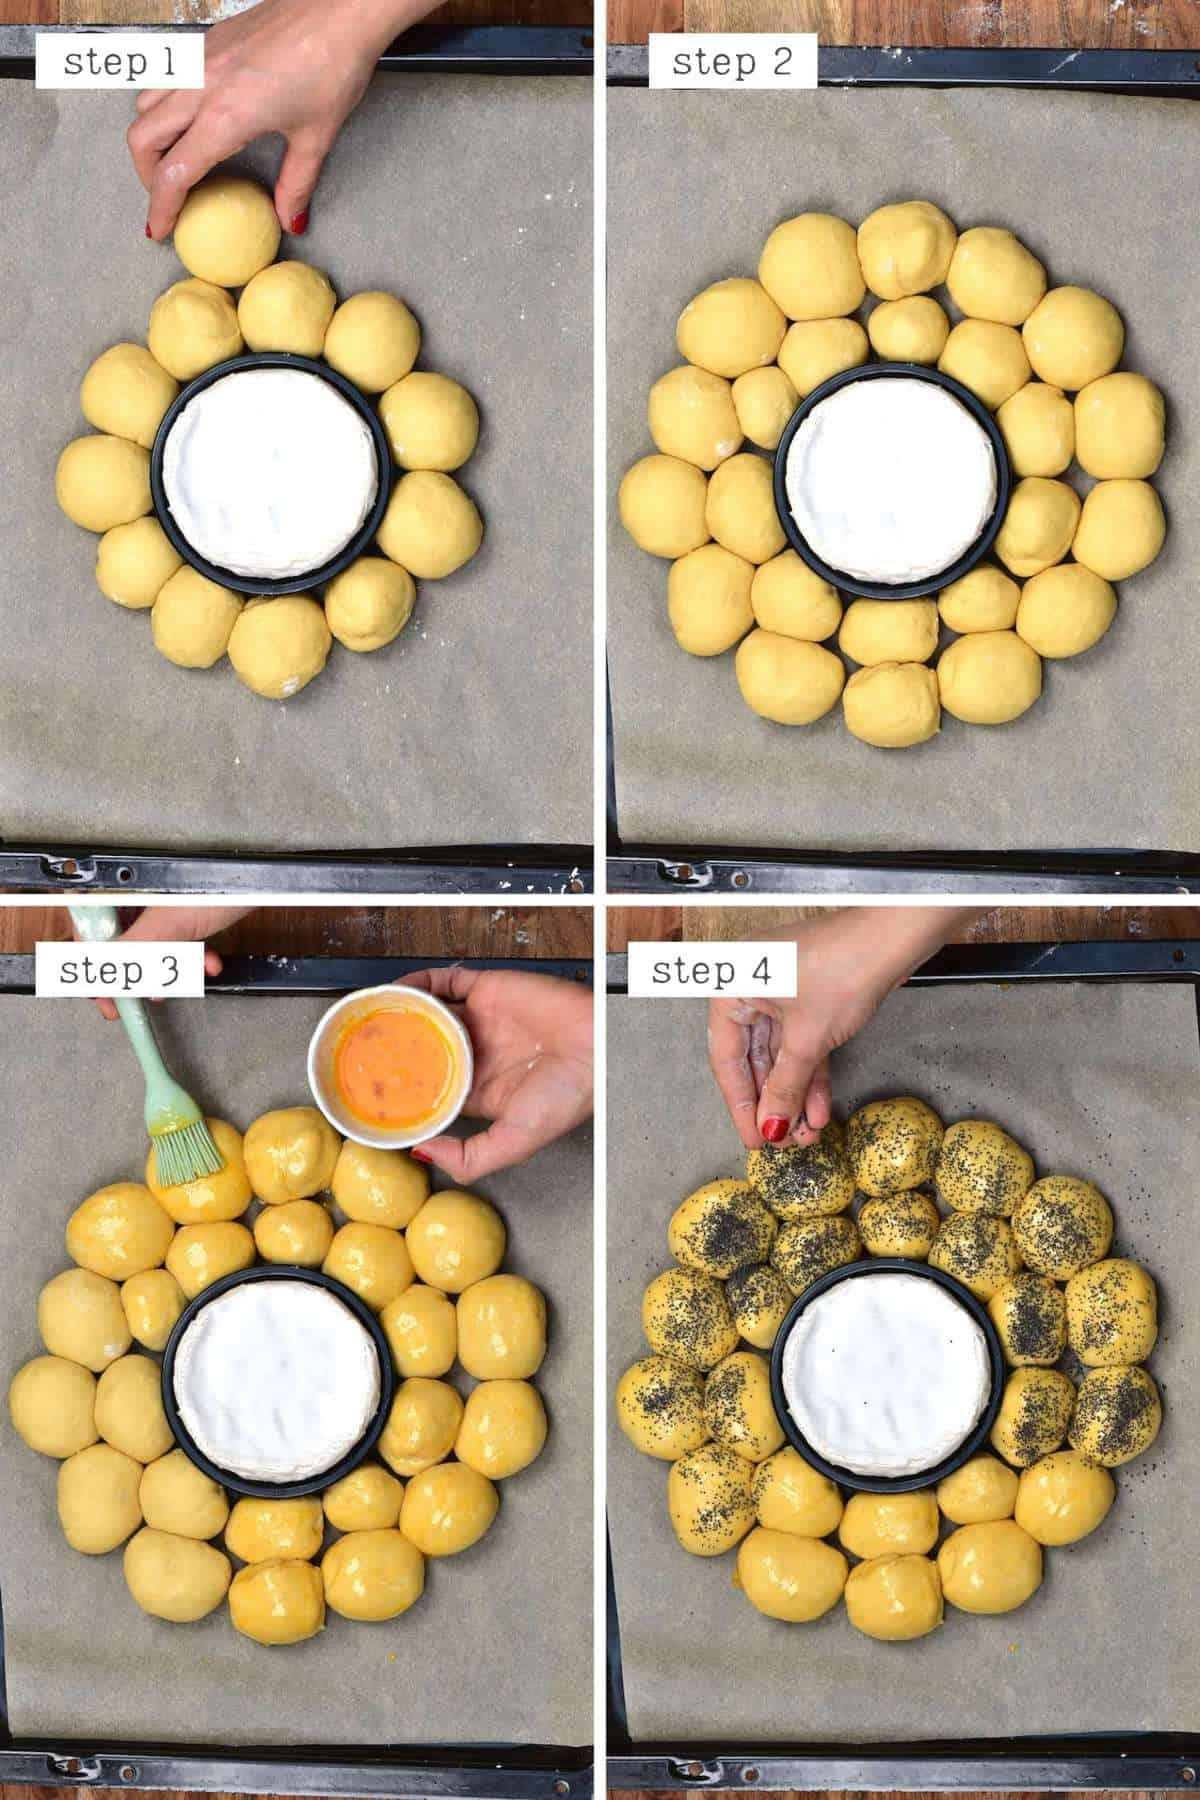 Arranging dough balls in a wreath shape